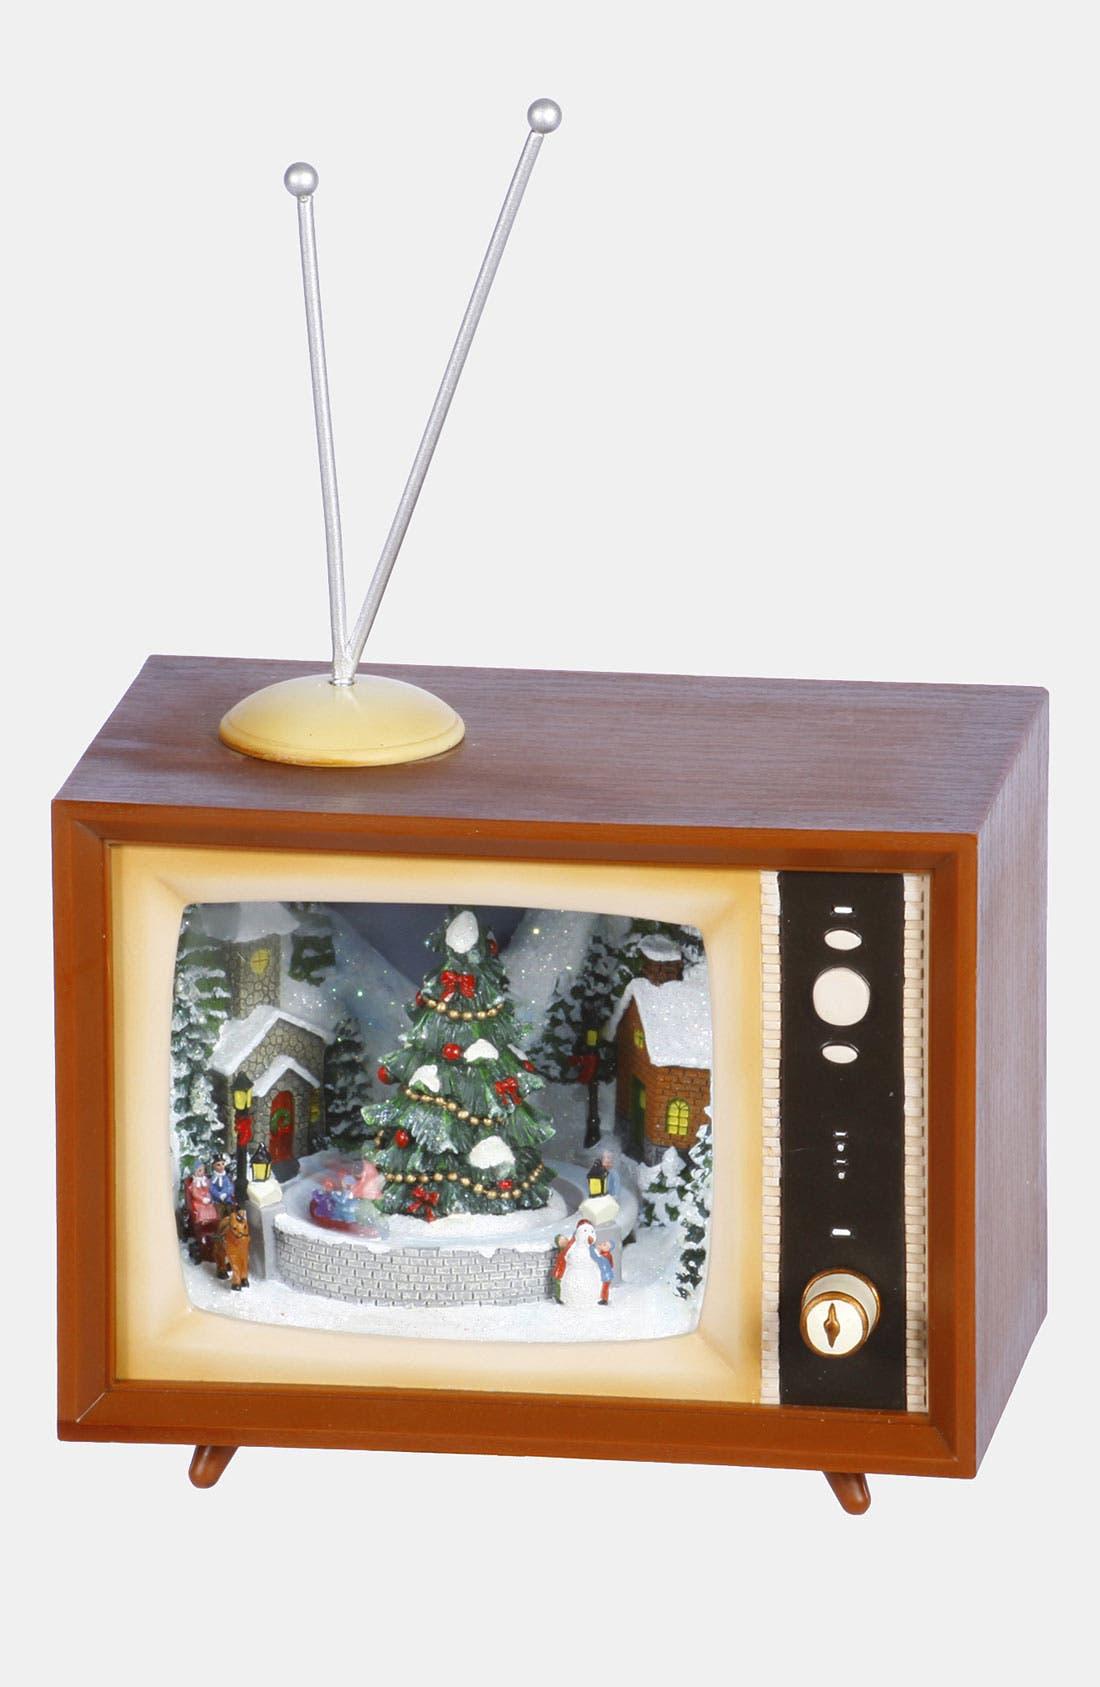 Main Image - Winward 'Mini TV - Square' Music Box